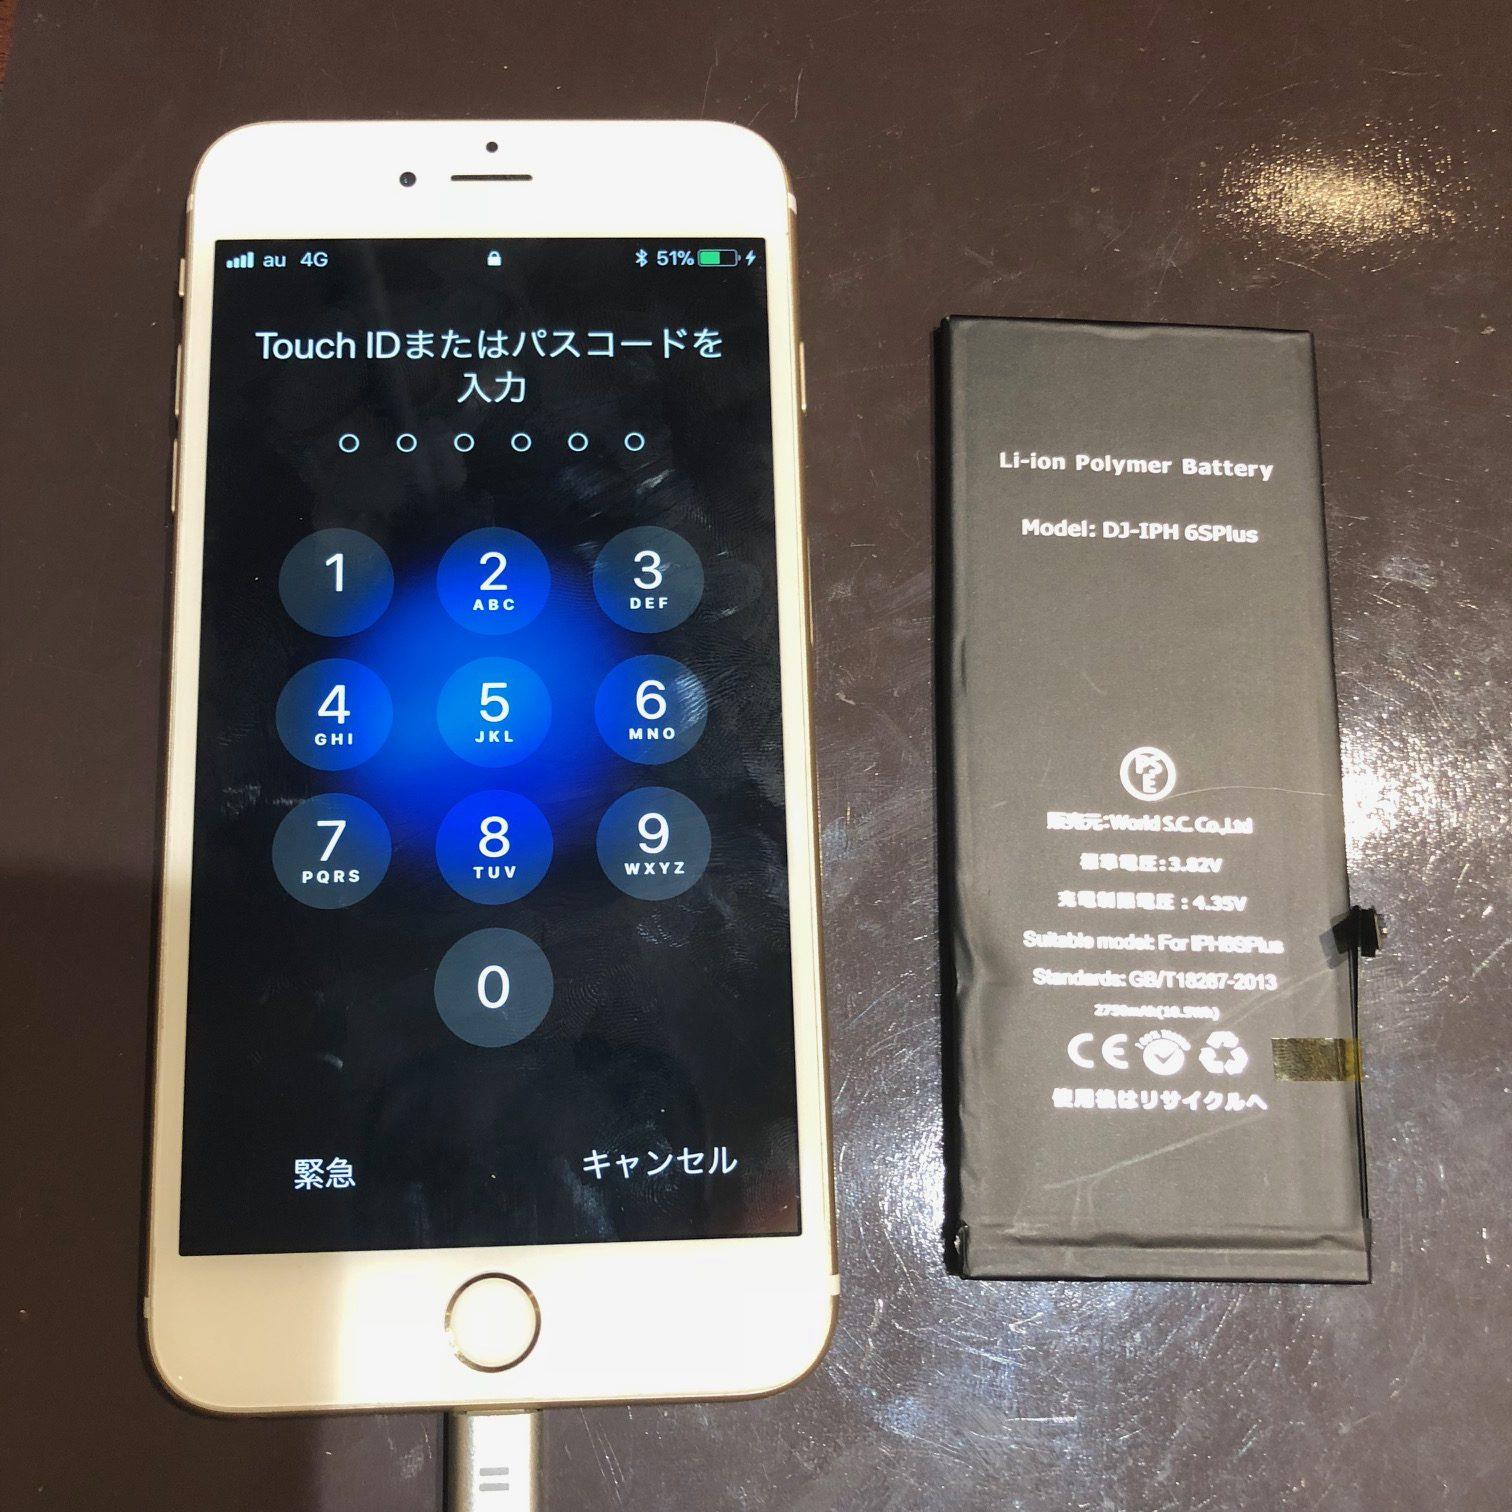 iPhone 6S Plus バッテリー交換 尼崎市よりお越しのお客様 s